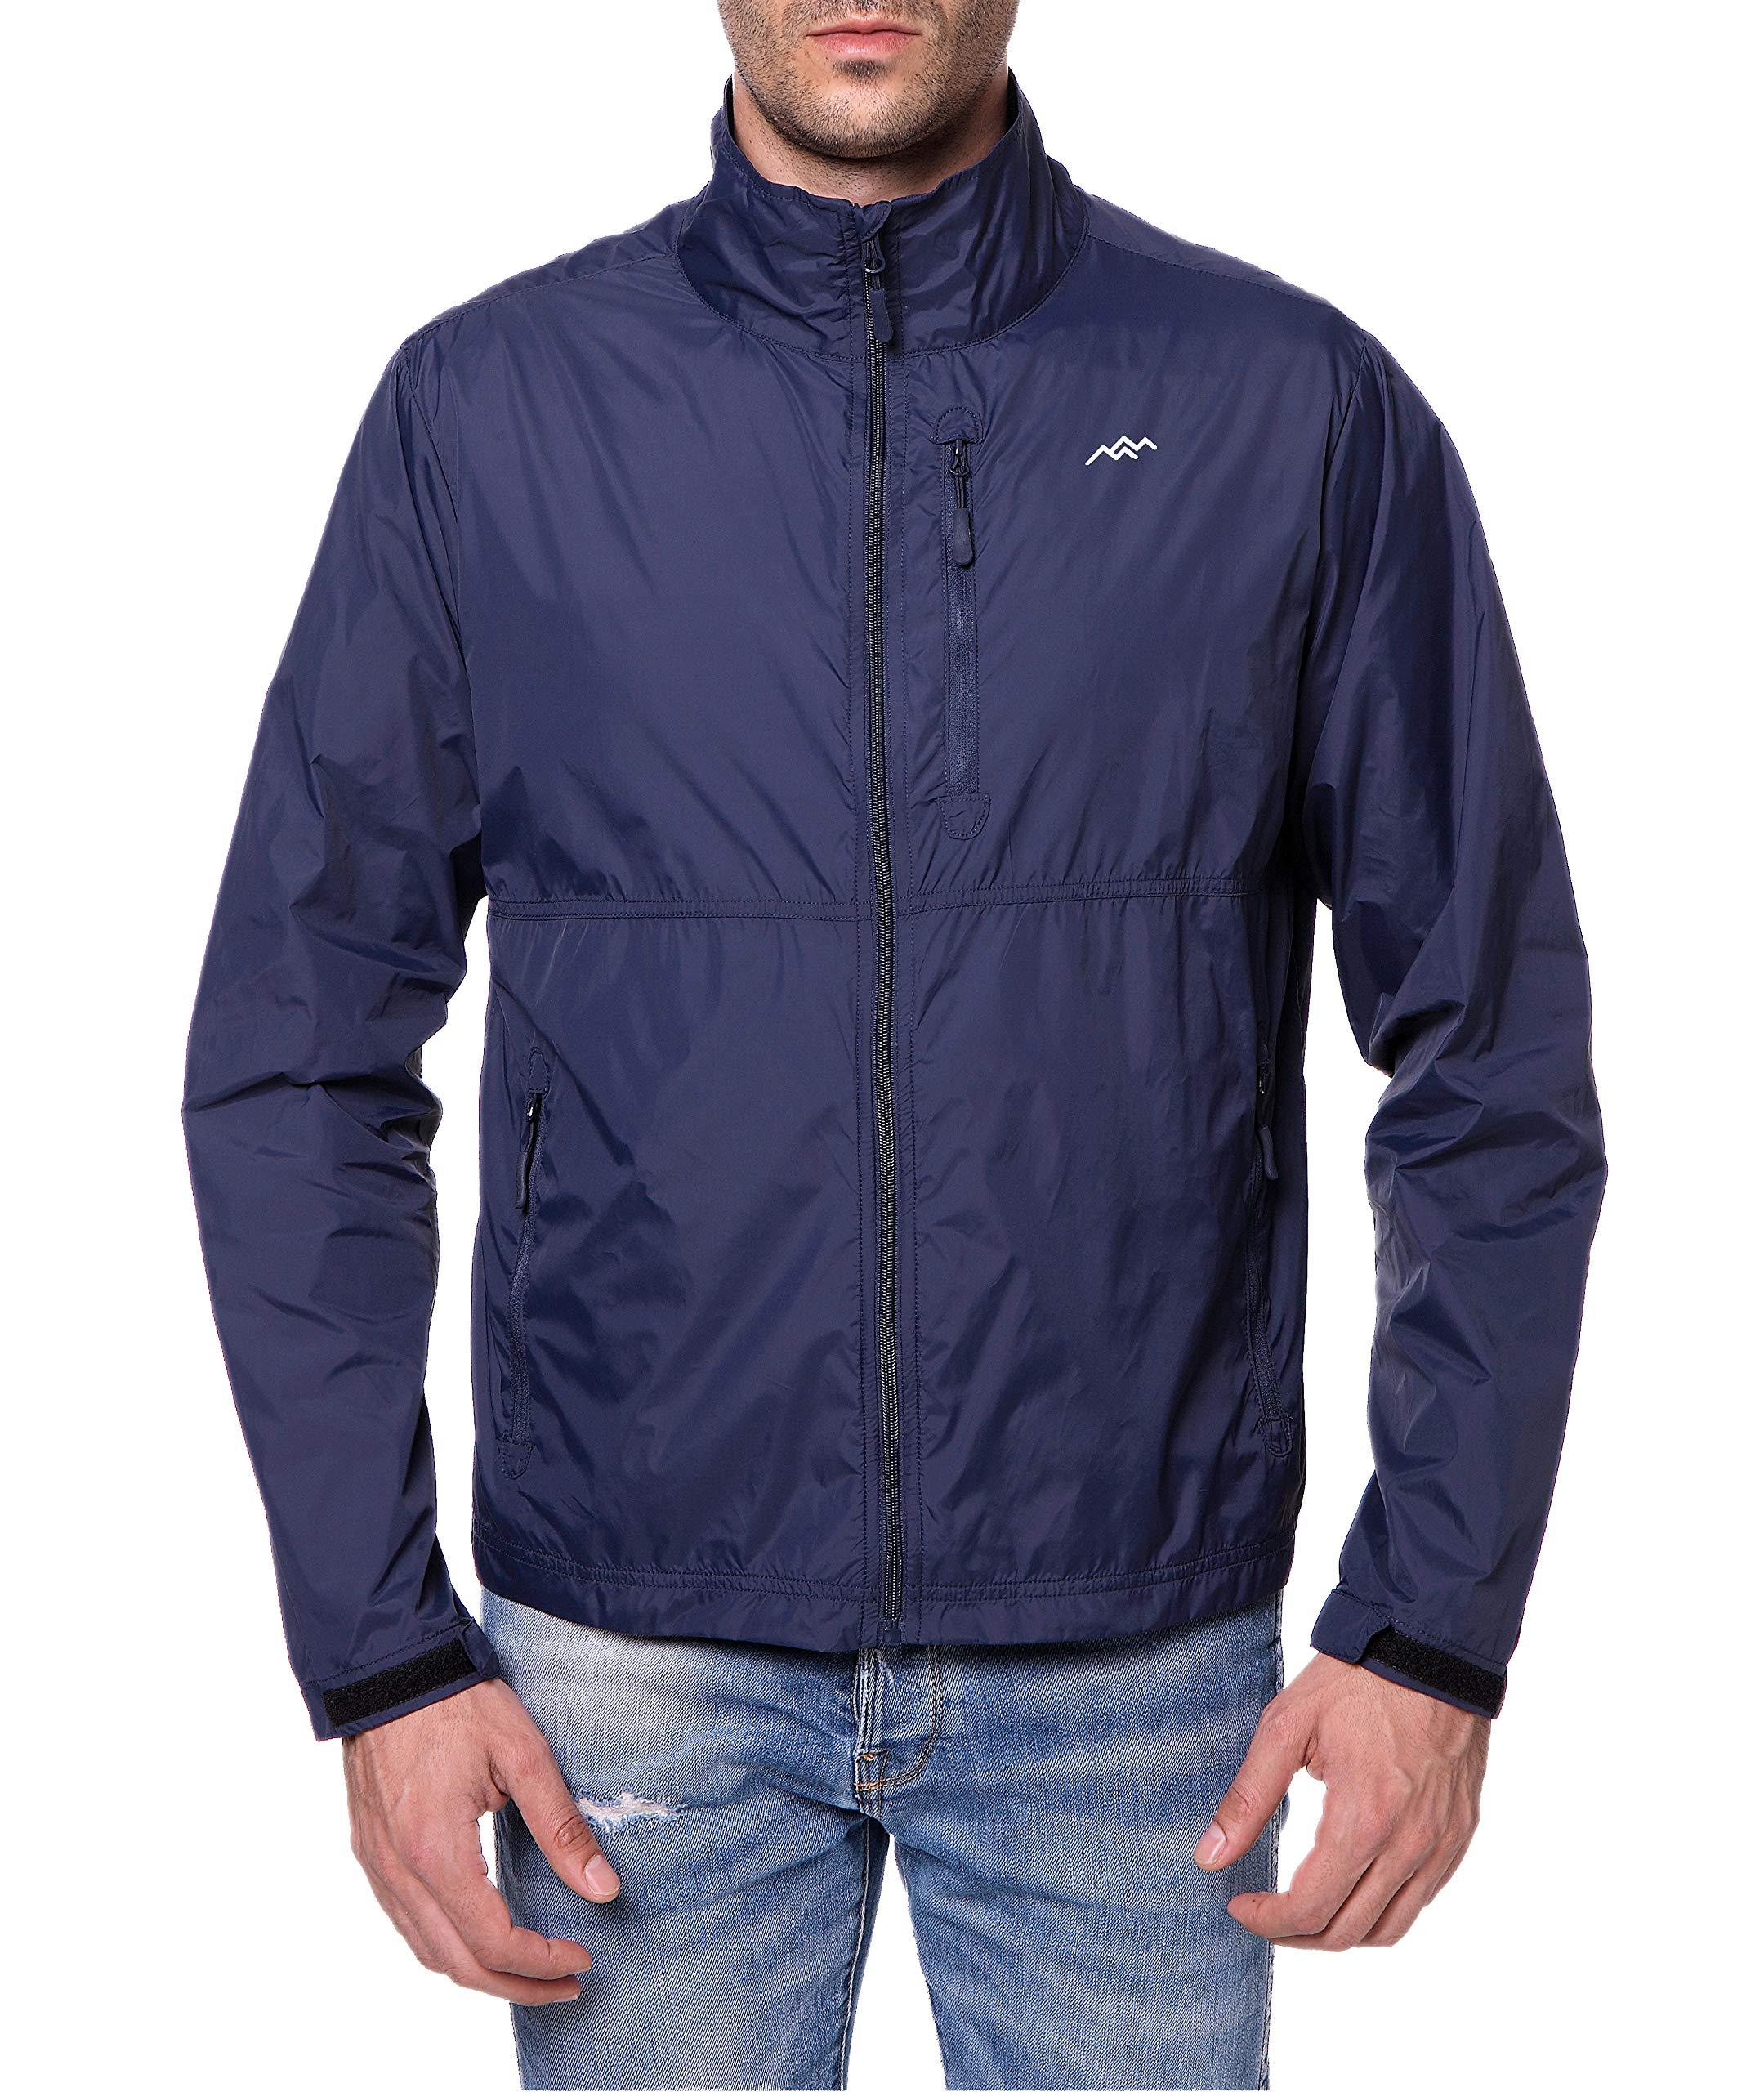 Trailside Supply Co. Men's Water-Resistant Nylon Windbreaker Front-Zip up Jacket, Sapphire Blue, 2X-Large by Trailside Supply Co.